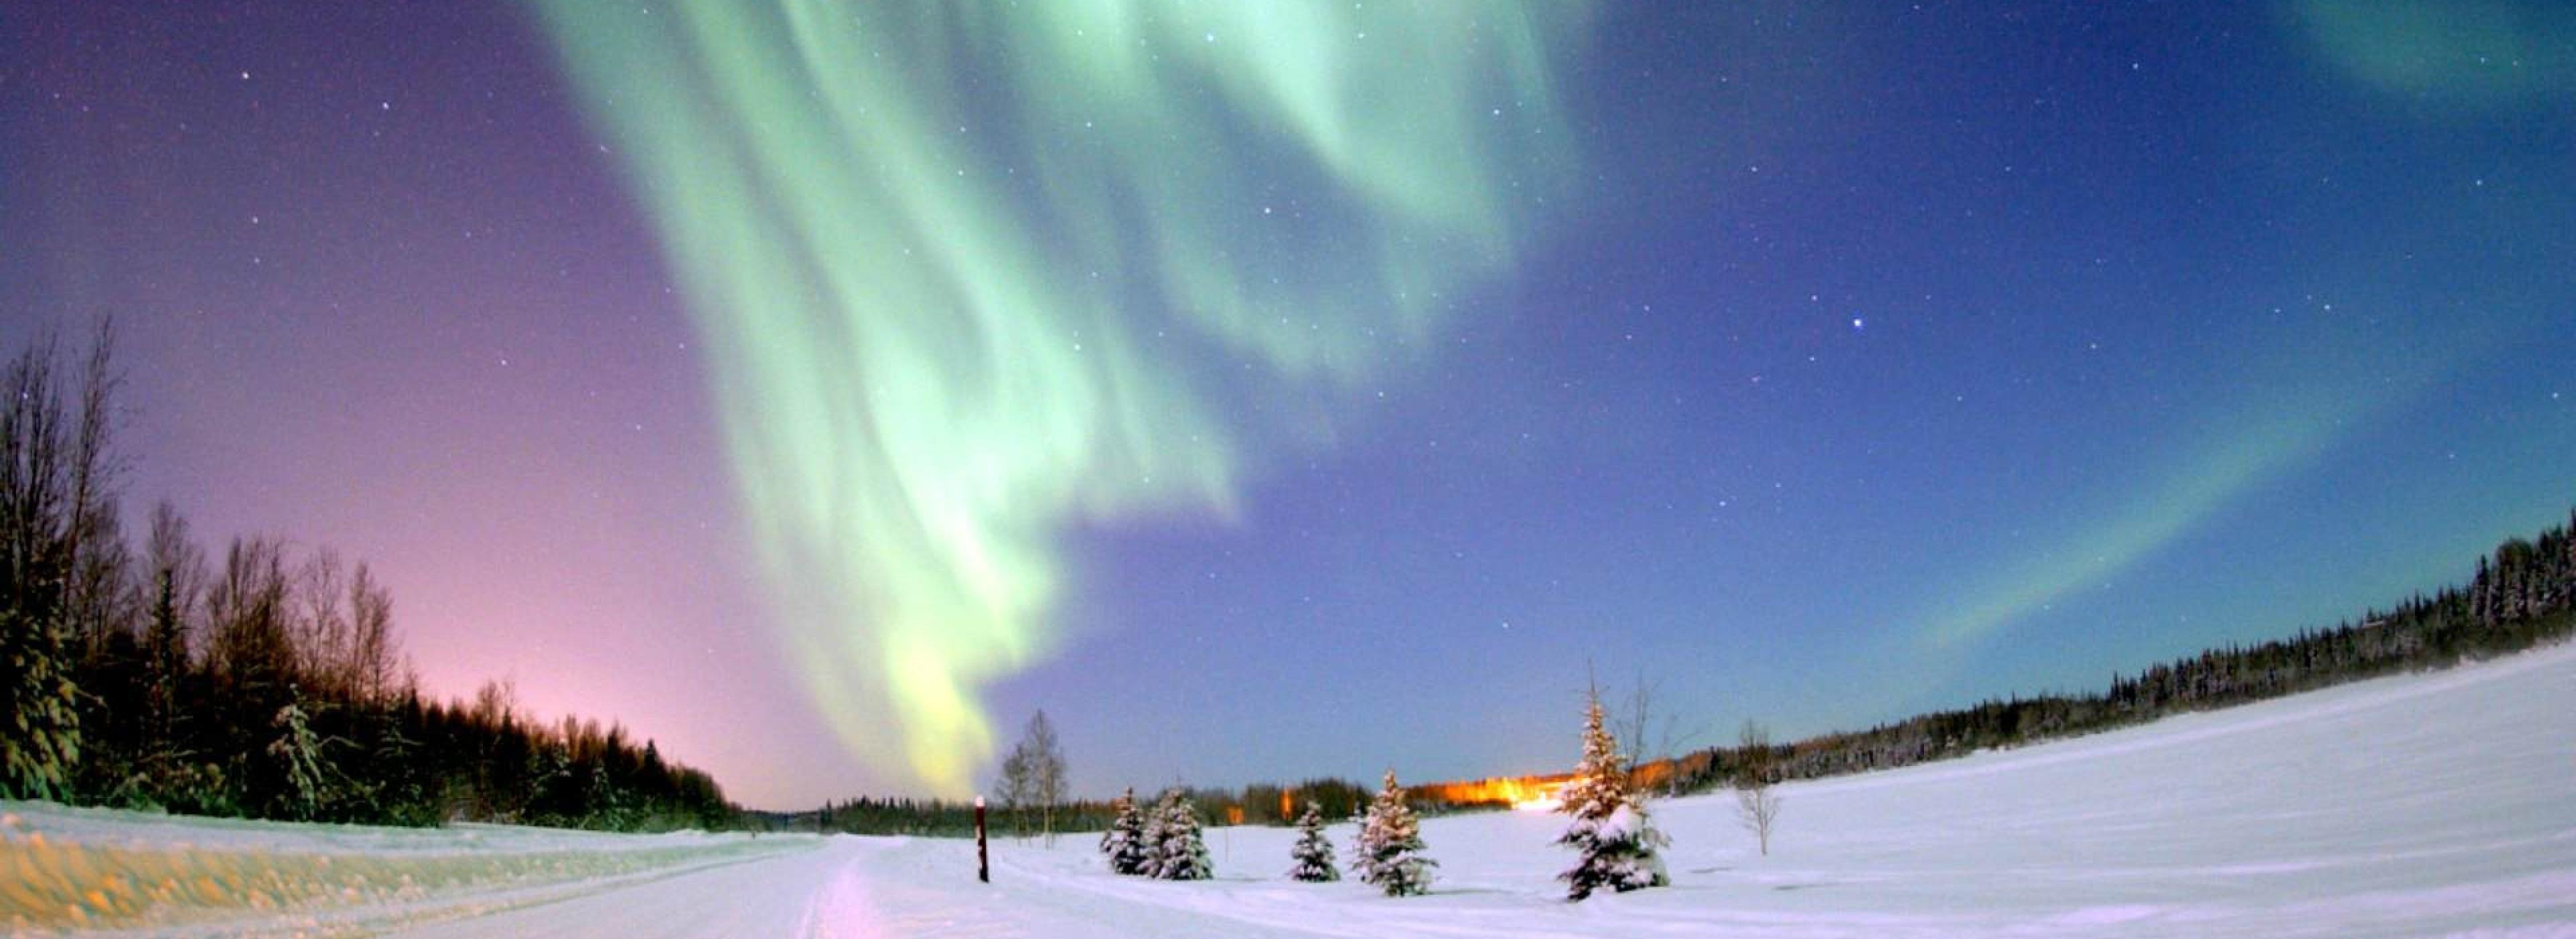 Russia Northern Lights